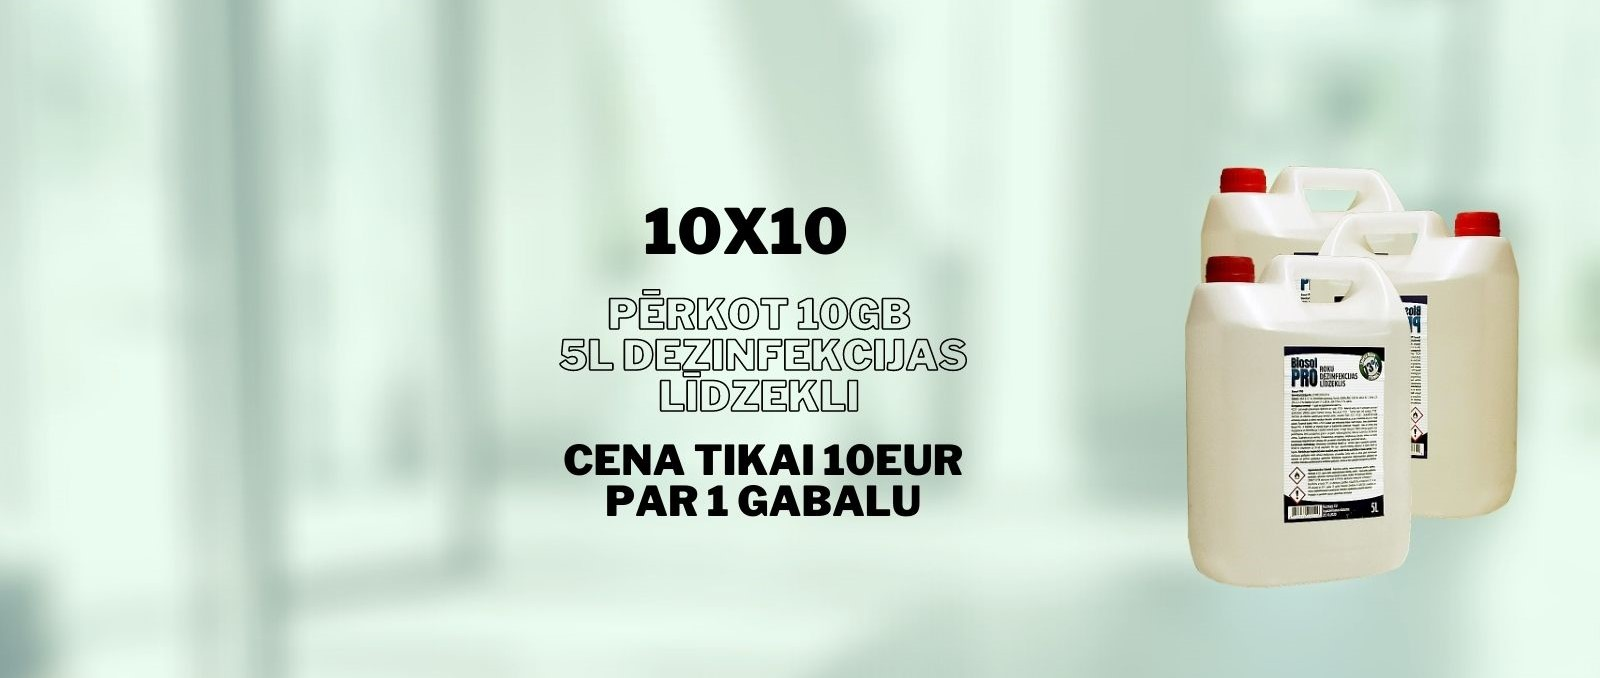 5l 10×10 (9)